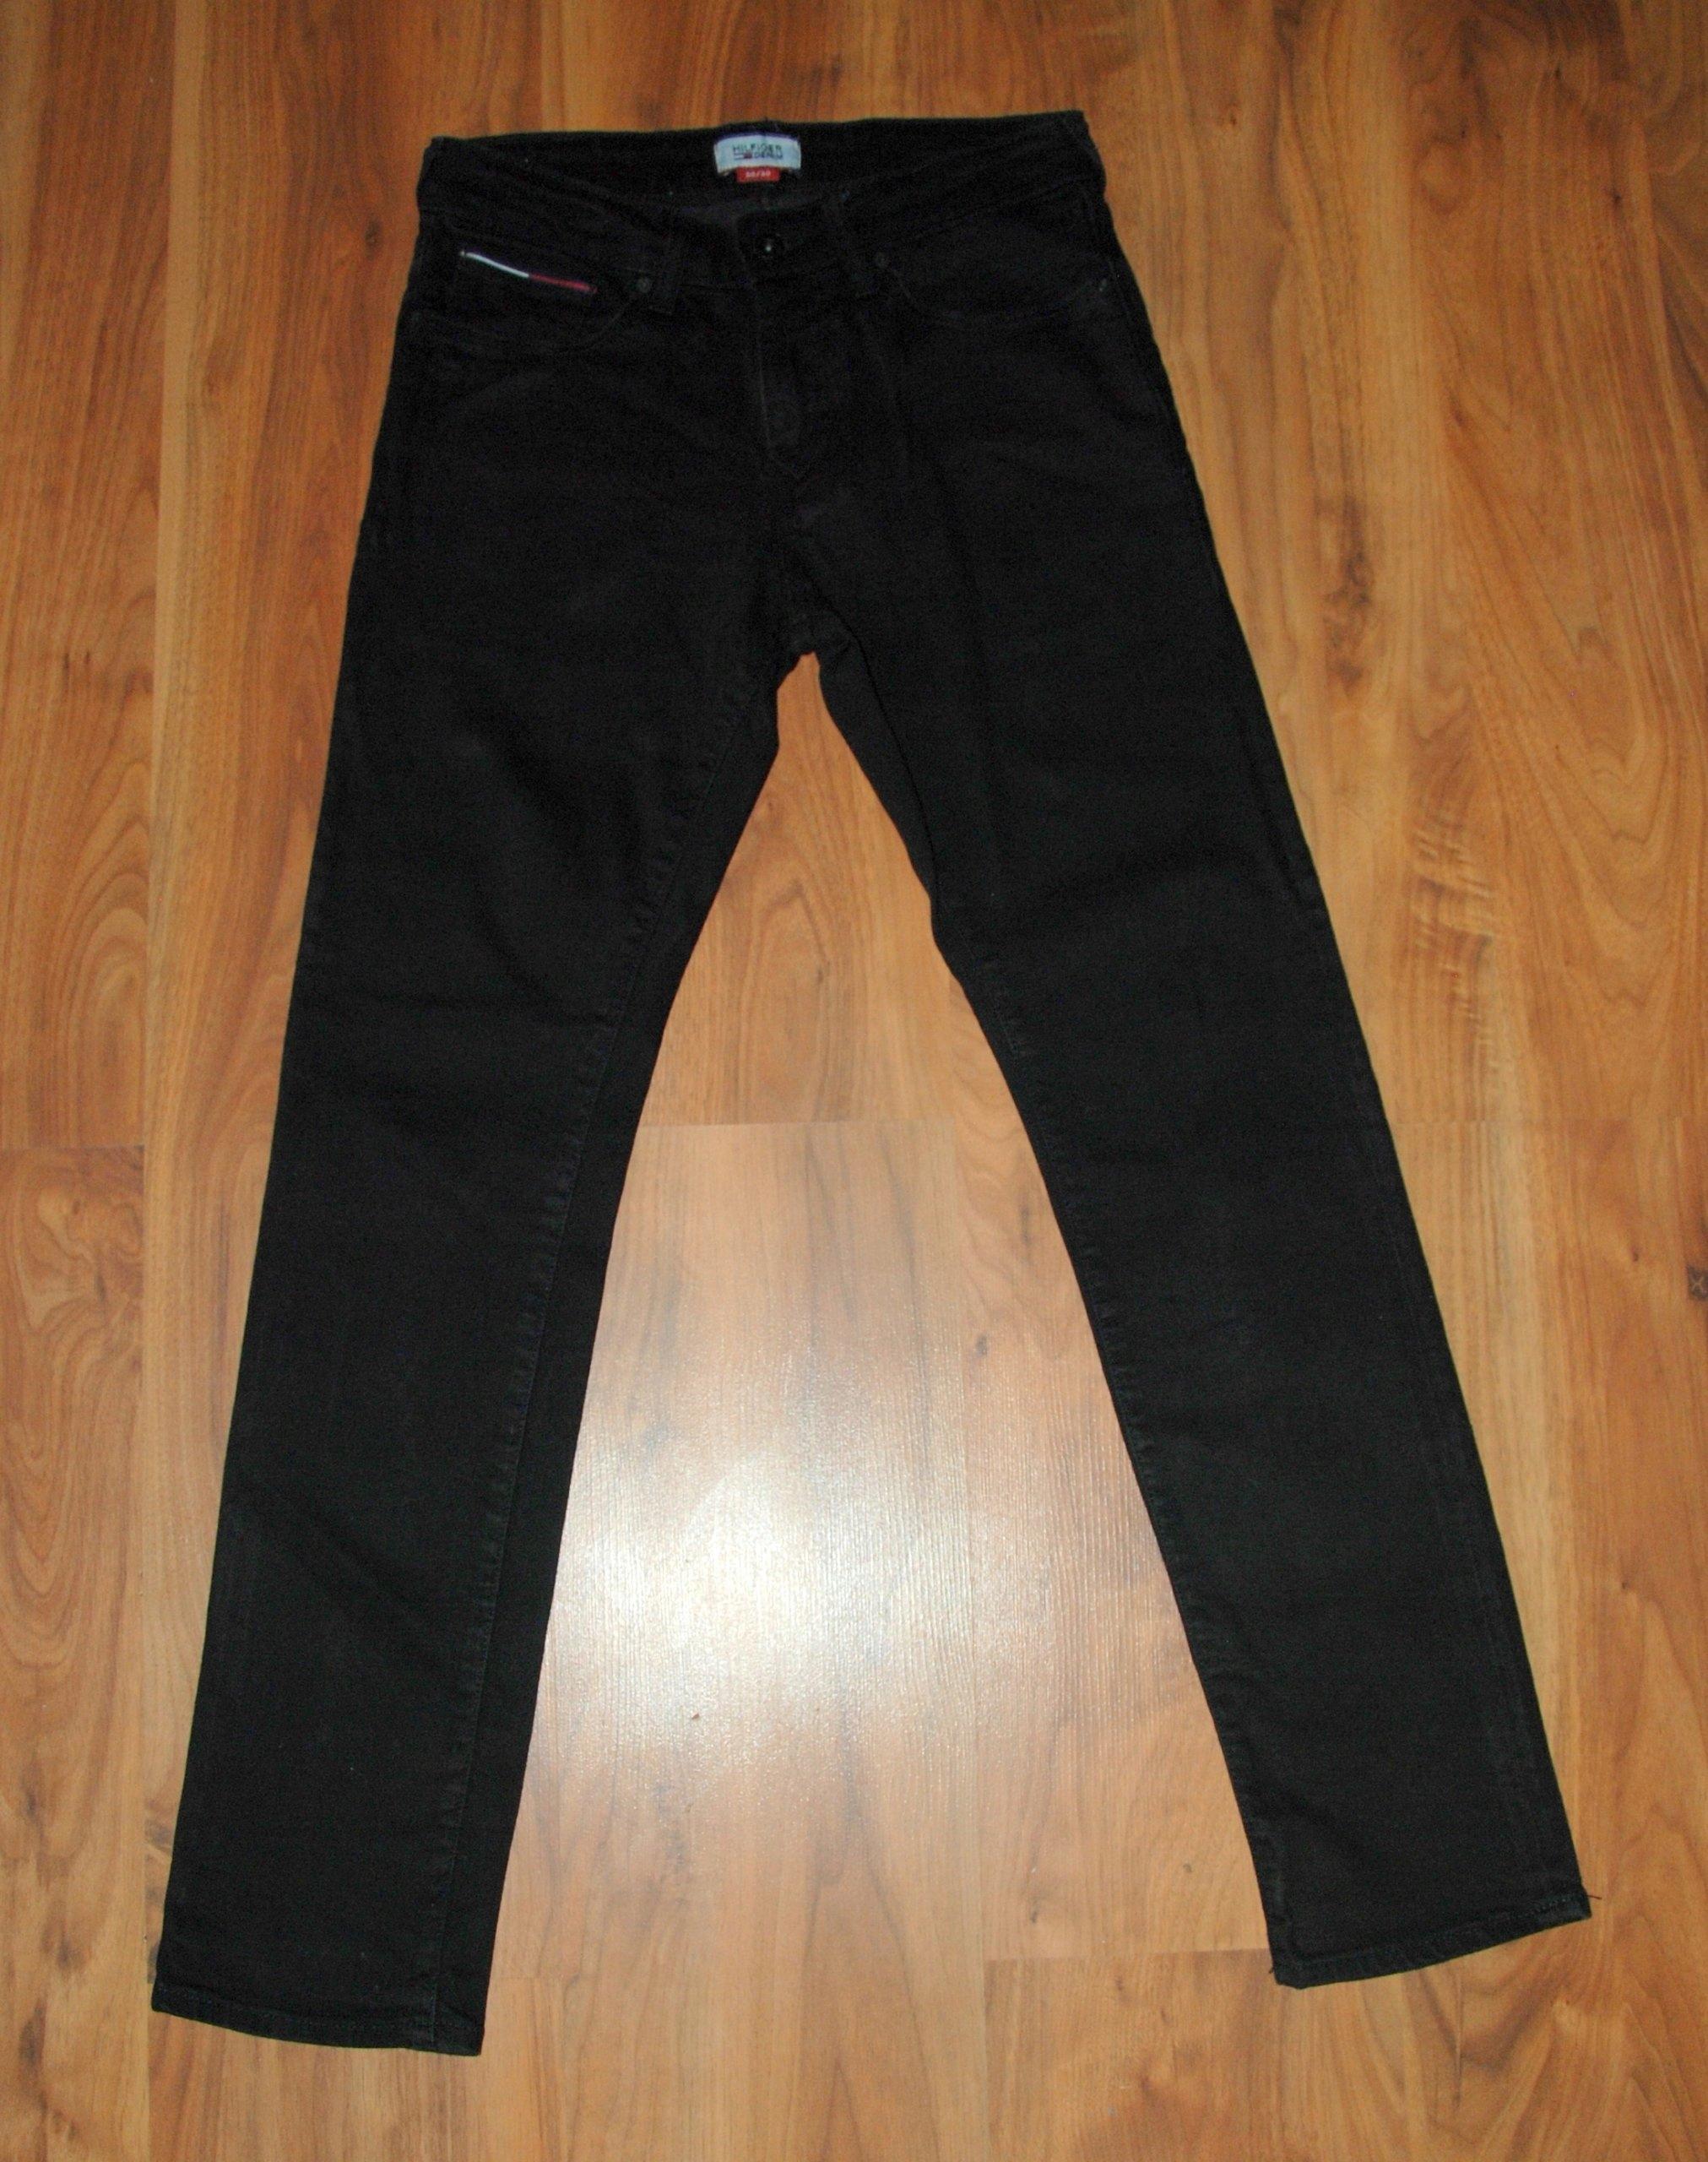 faf008fa738d0 jeansy spodnie Tommy Hilfiger roz. 30/30 W30 L30 - 7427773315 ...